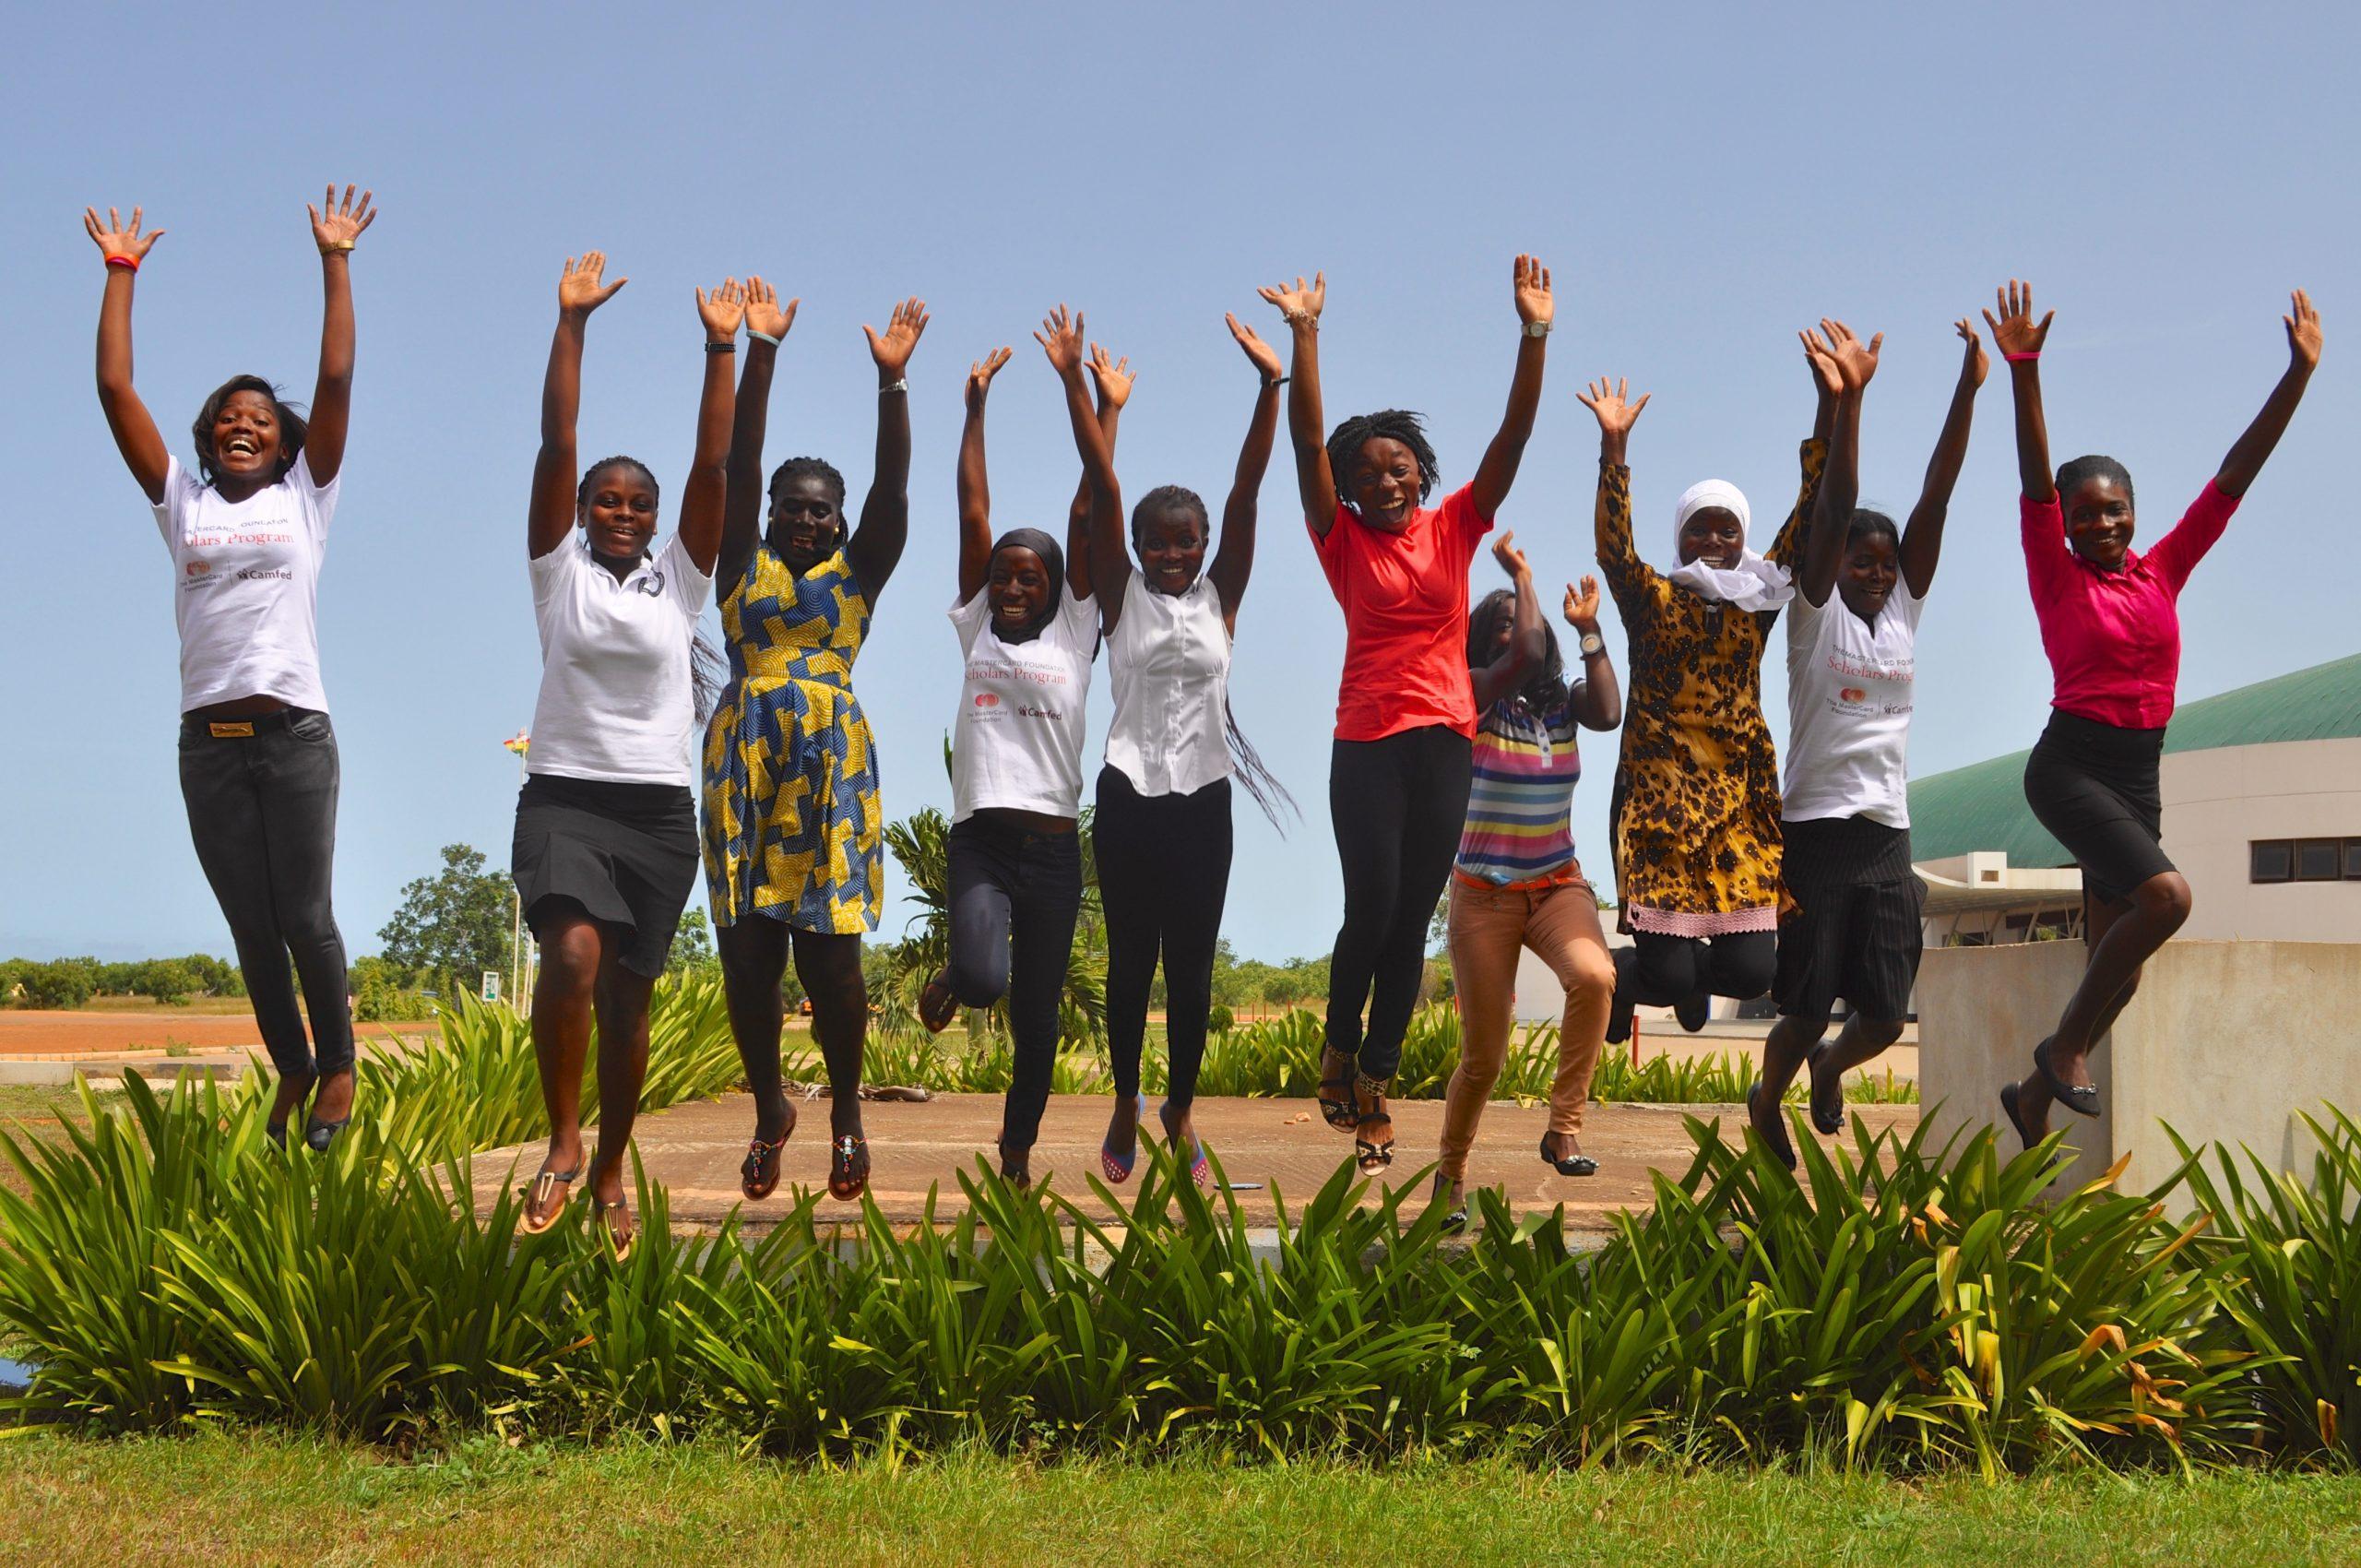 CAMA-MCF-Scholars-Accra-GH-Patrick-Hayes-30-May-2015-2529_1